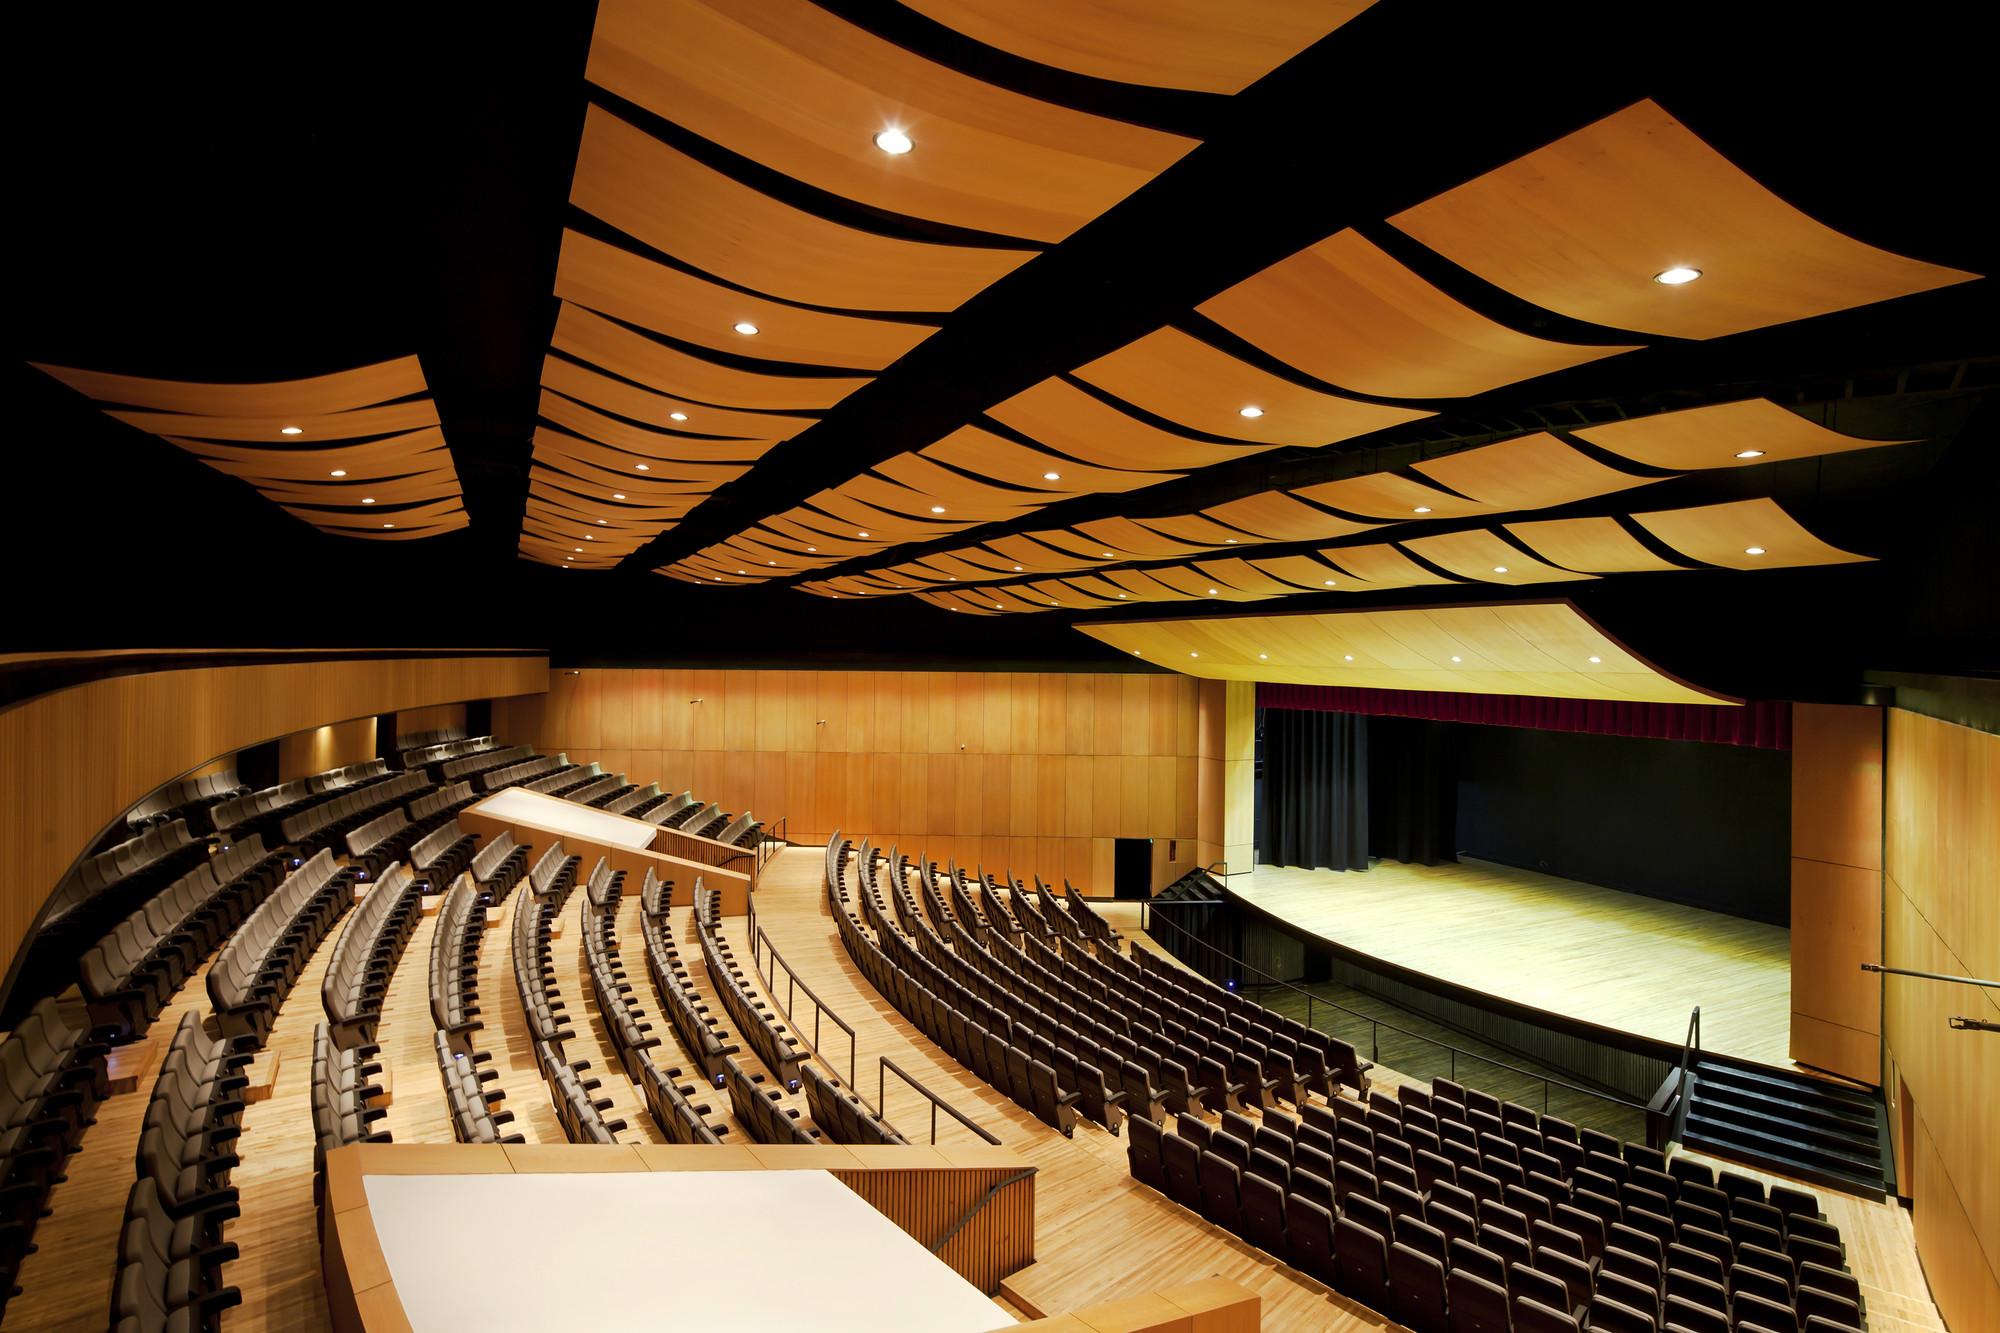 University of Cuenca Theater  / Javier Durán